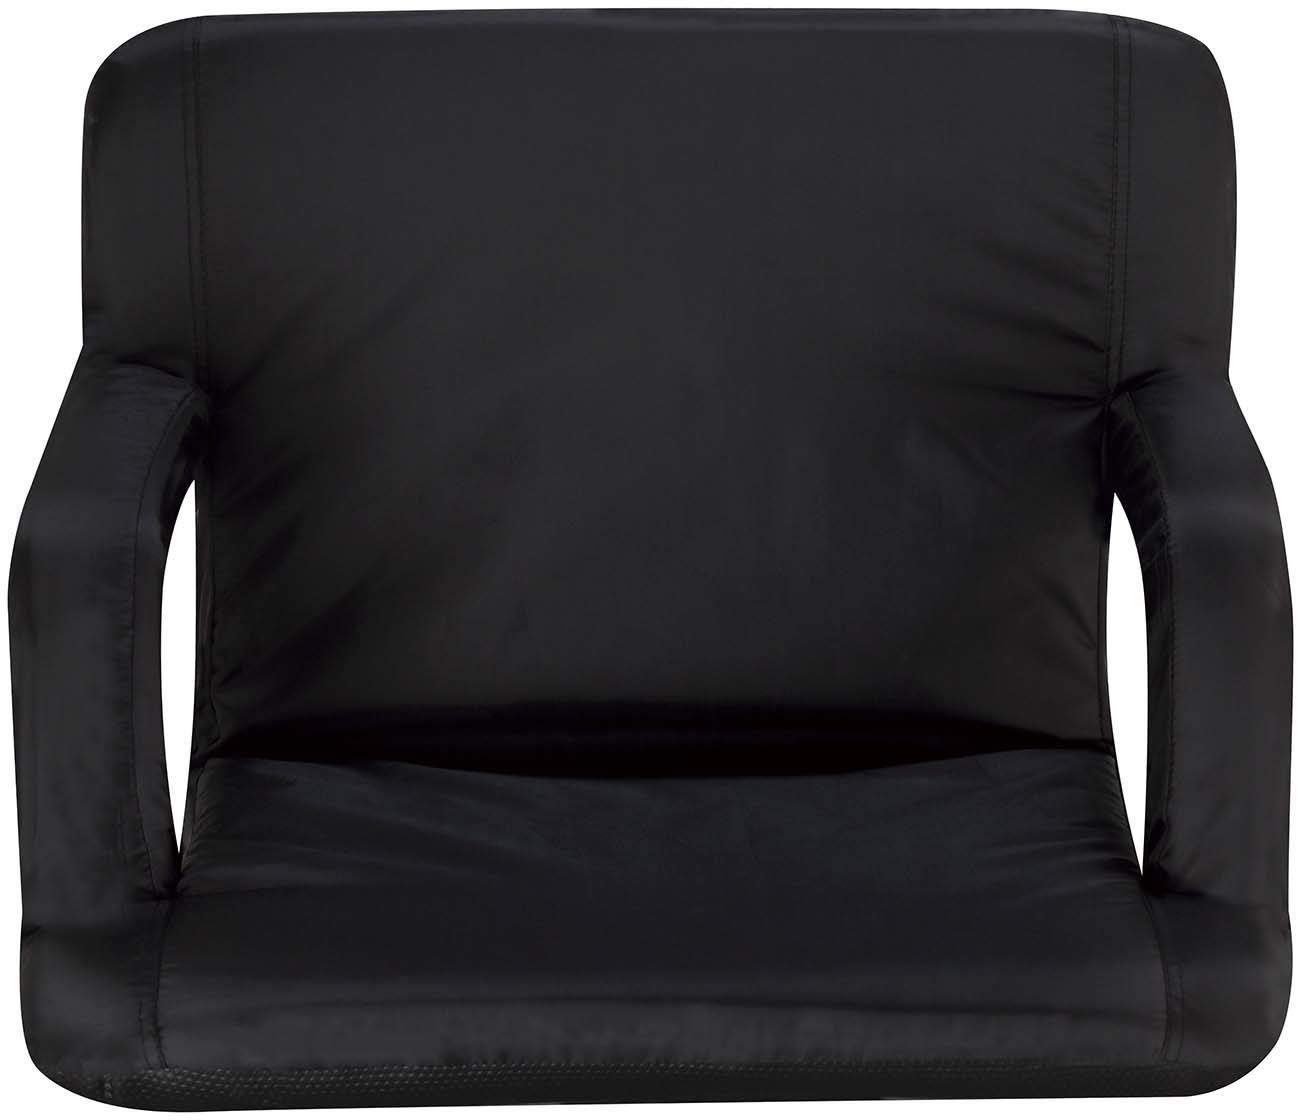 Naomi Home Venice Stadium Seat for Bleachers Portable Reclining with Armrest Grande/Black